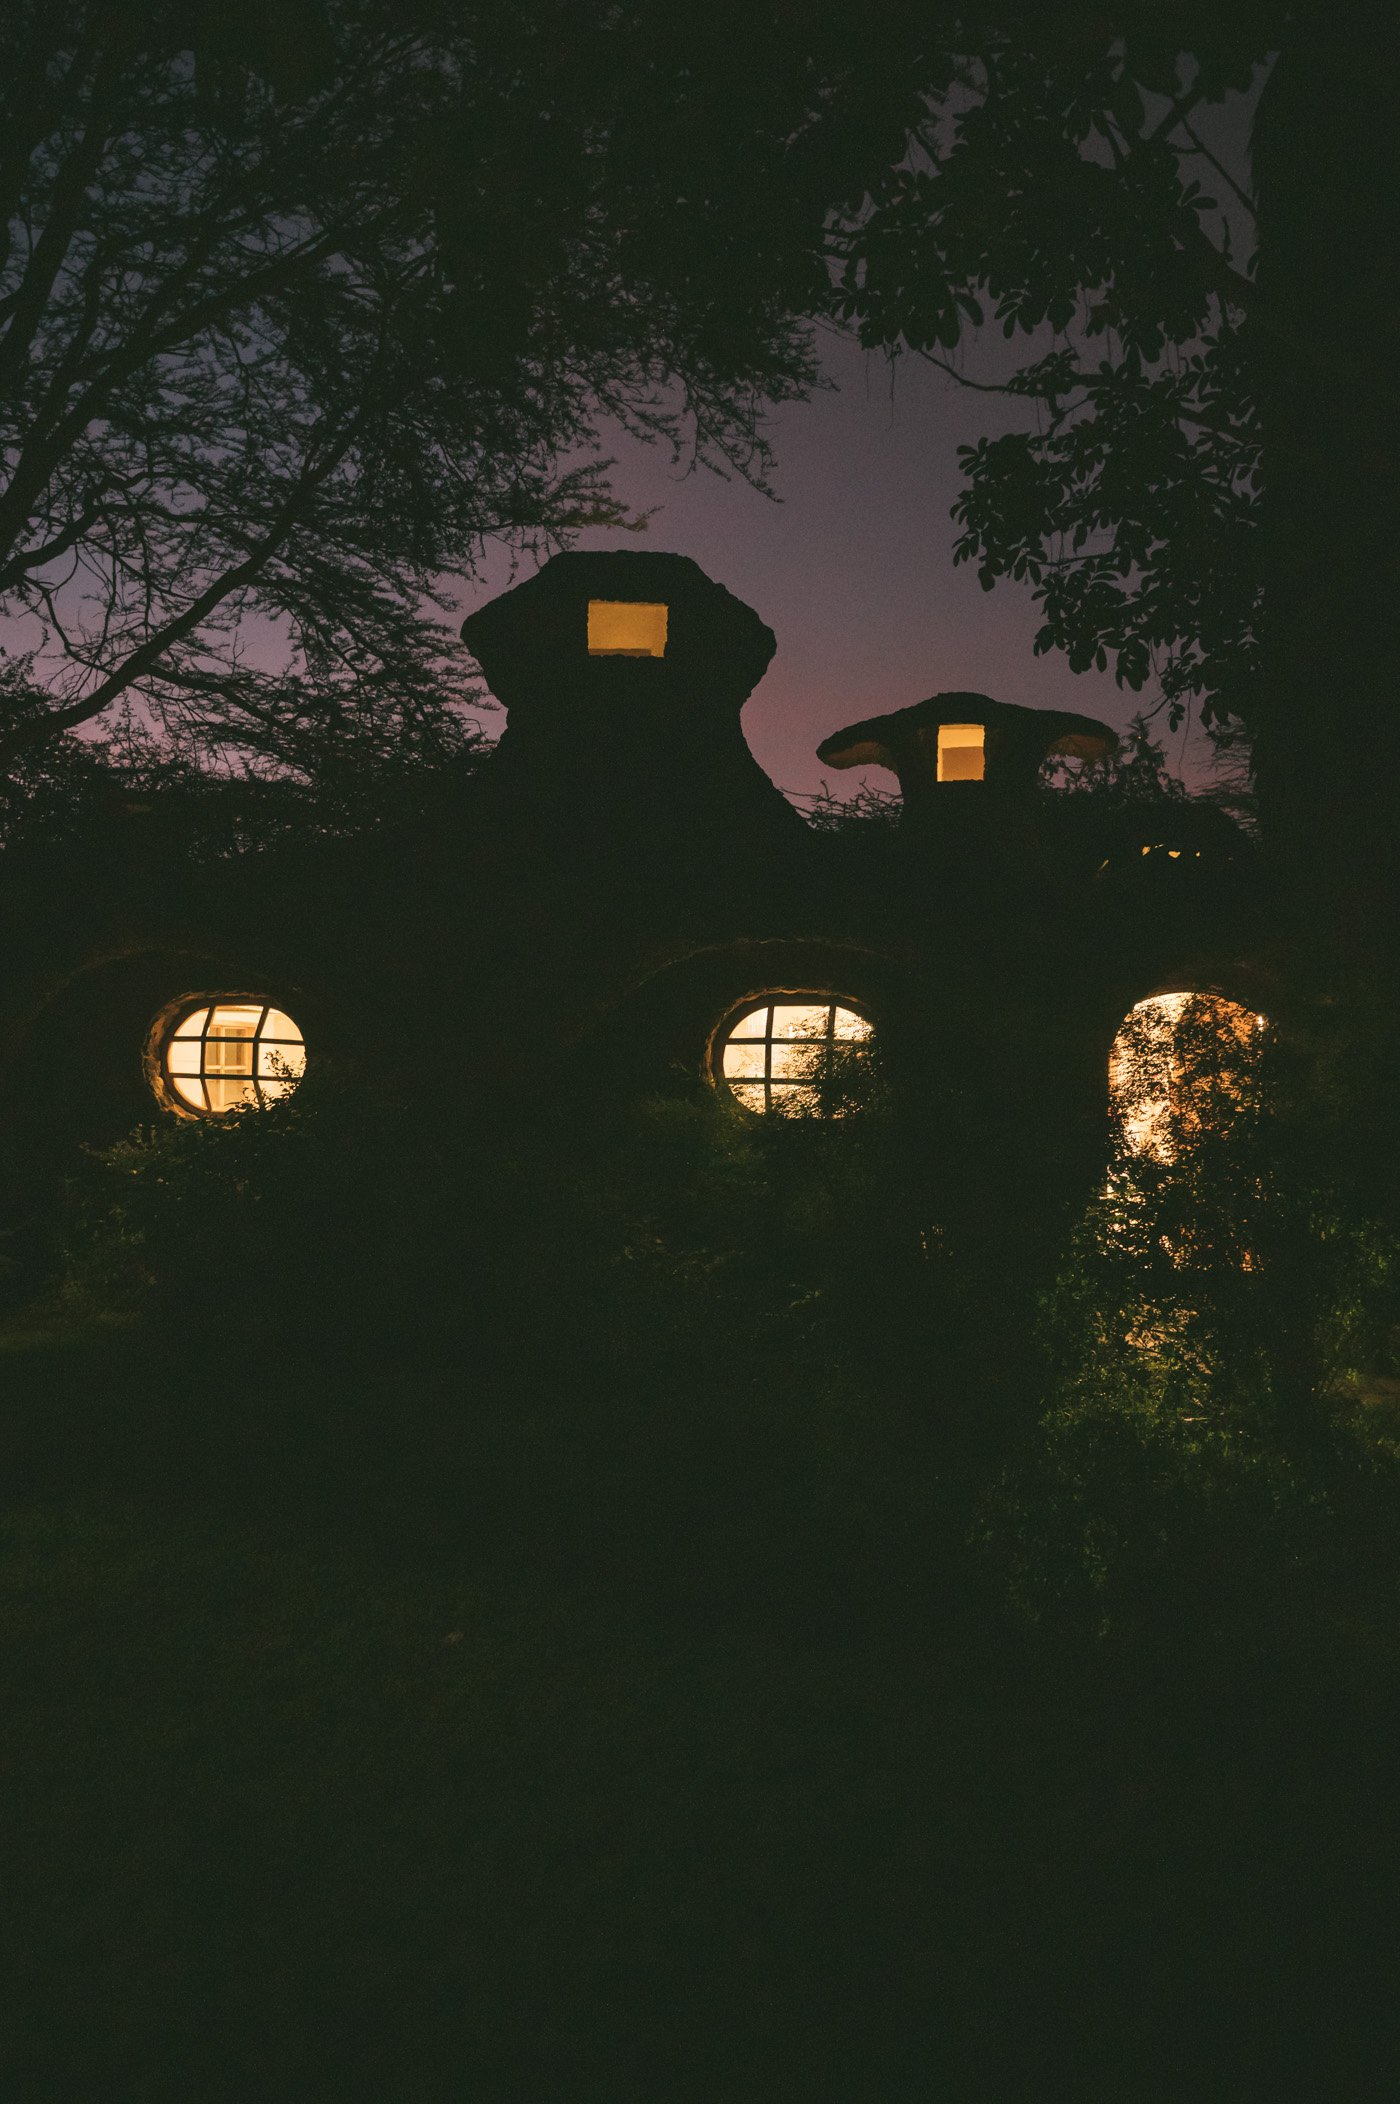 Lewa House at dusk - located inside Lewa Wildlife Conservancy Kenya